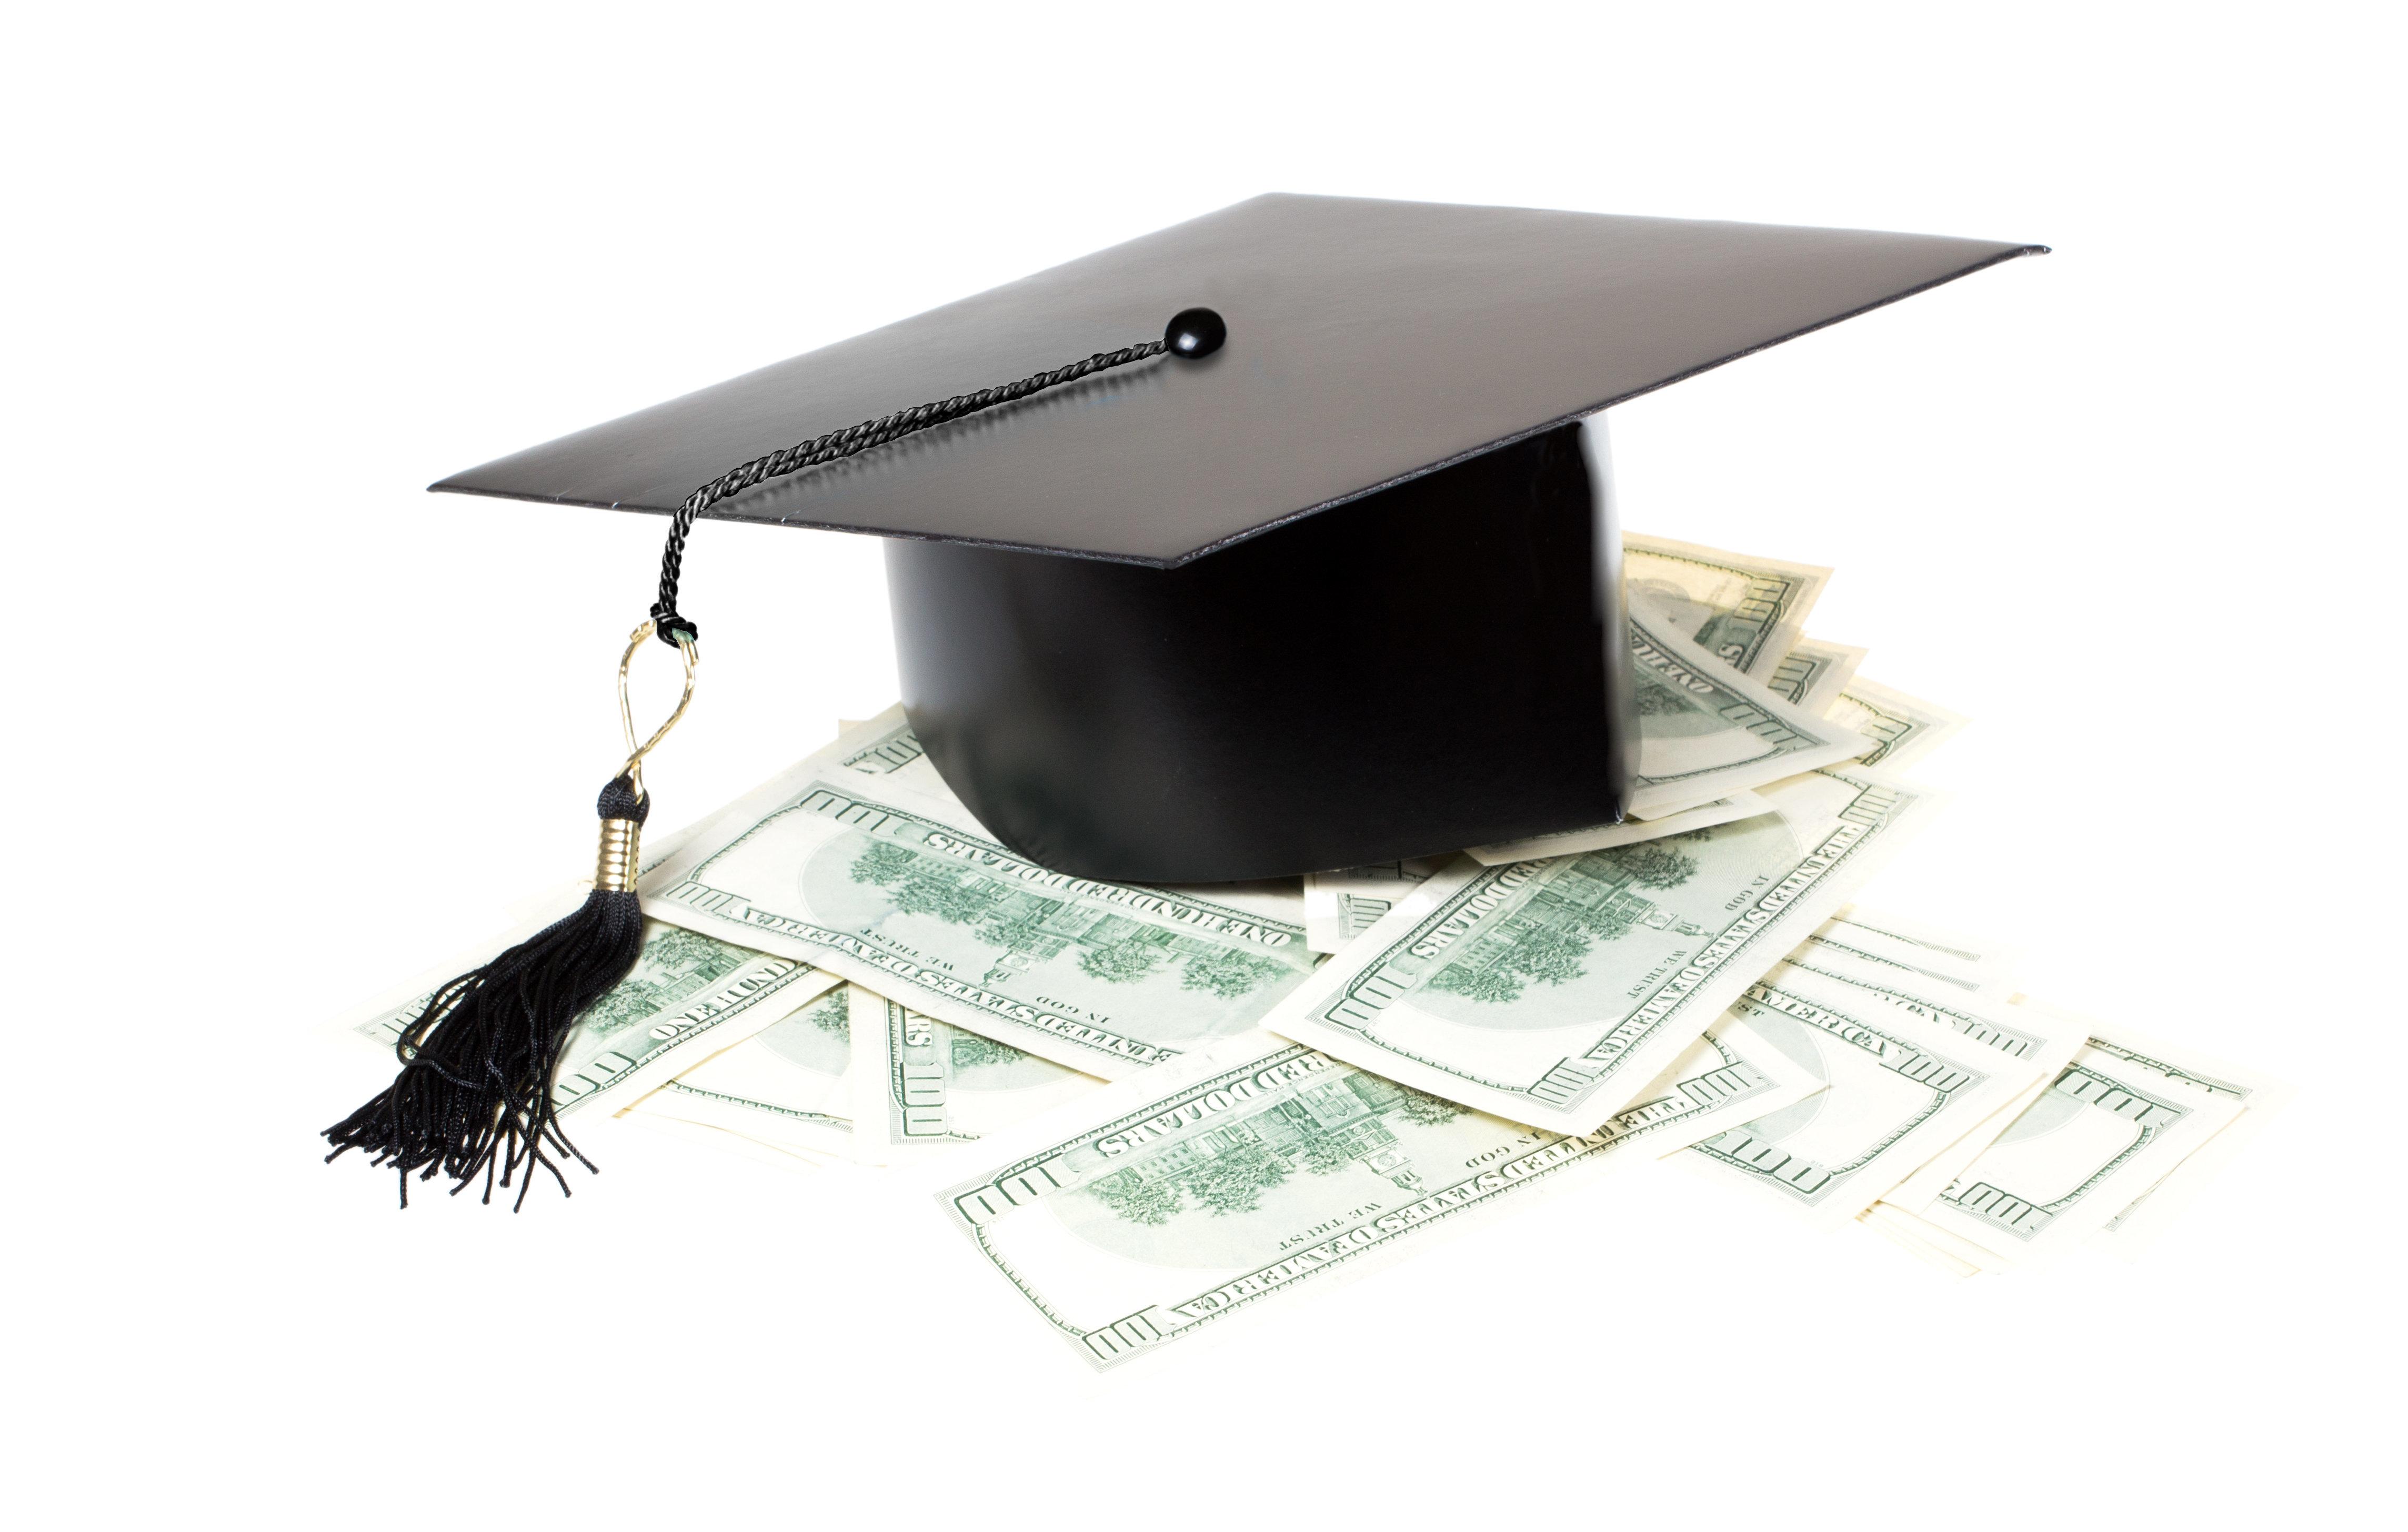 Paid education. Graduate cap on a pile of money